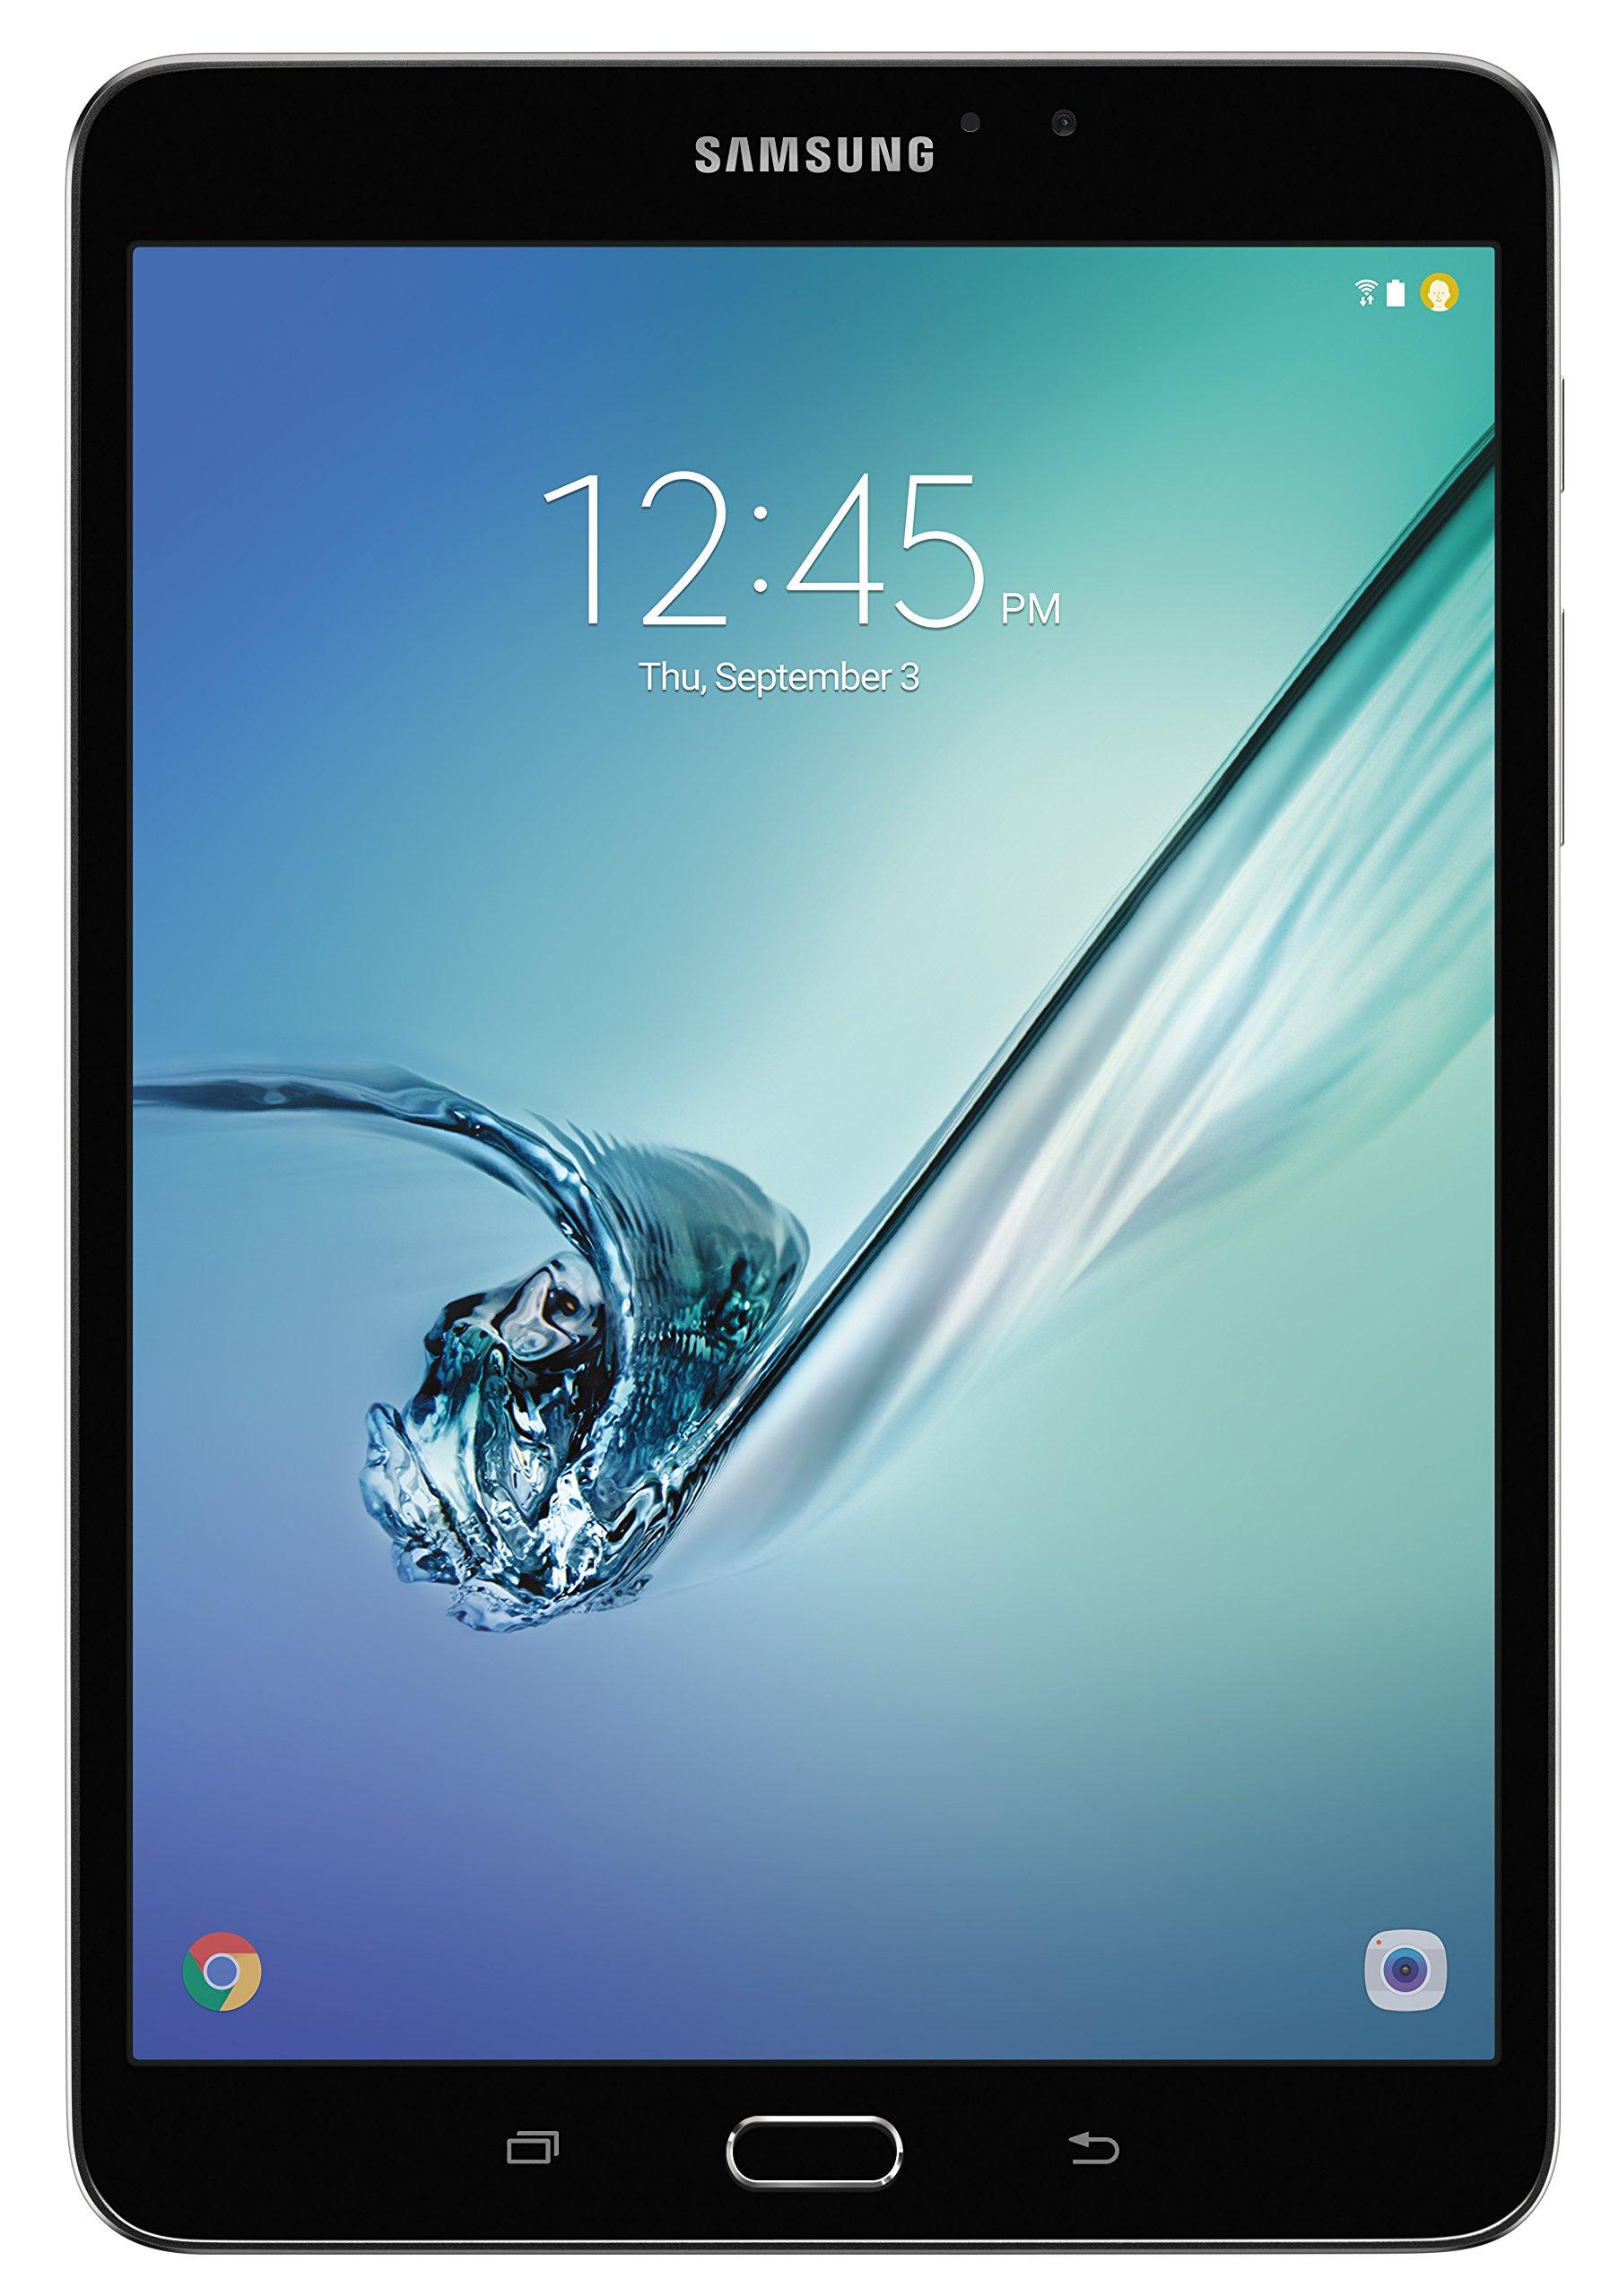 Samsung Galaxy Tab S2 8''; 32 GB Wifi Tablet (Black) SM-T713NZKEXAR